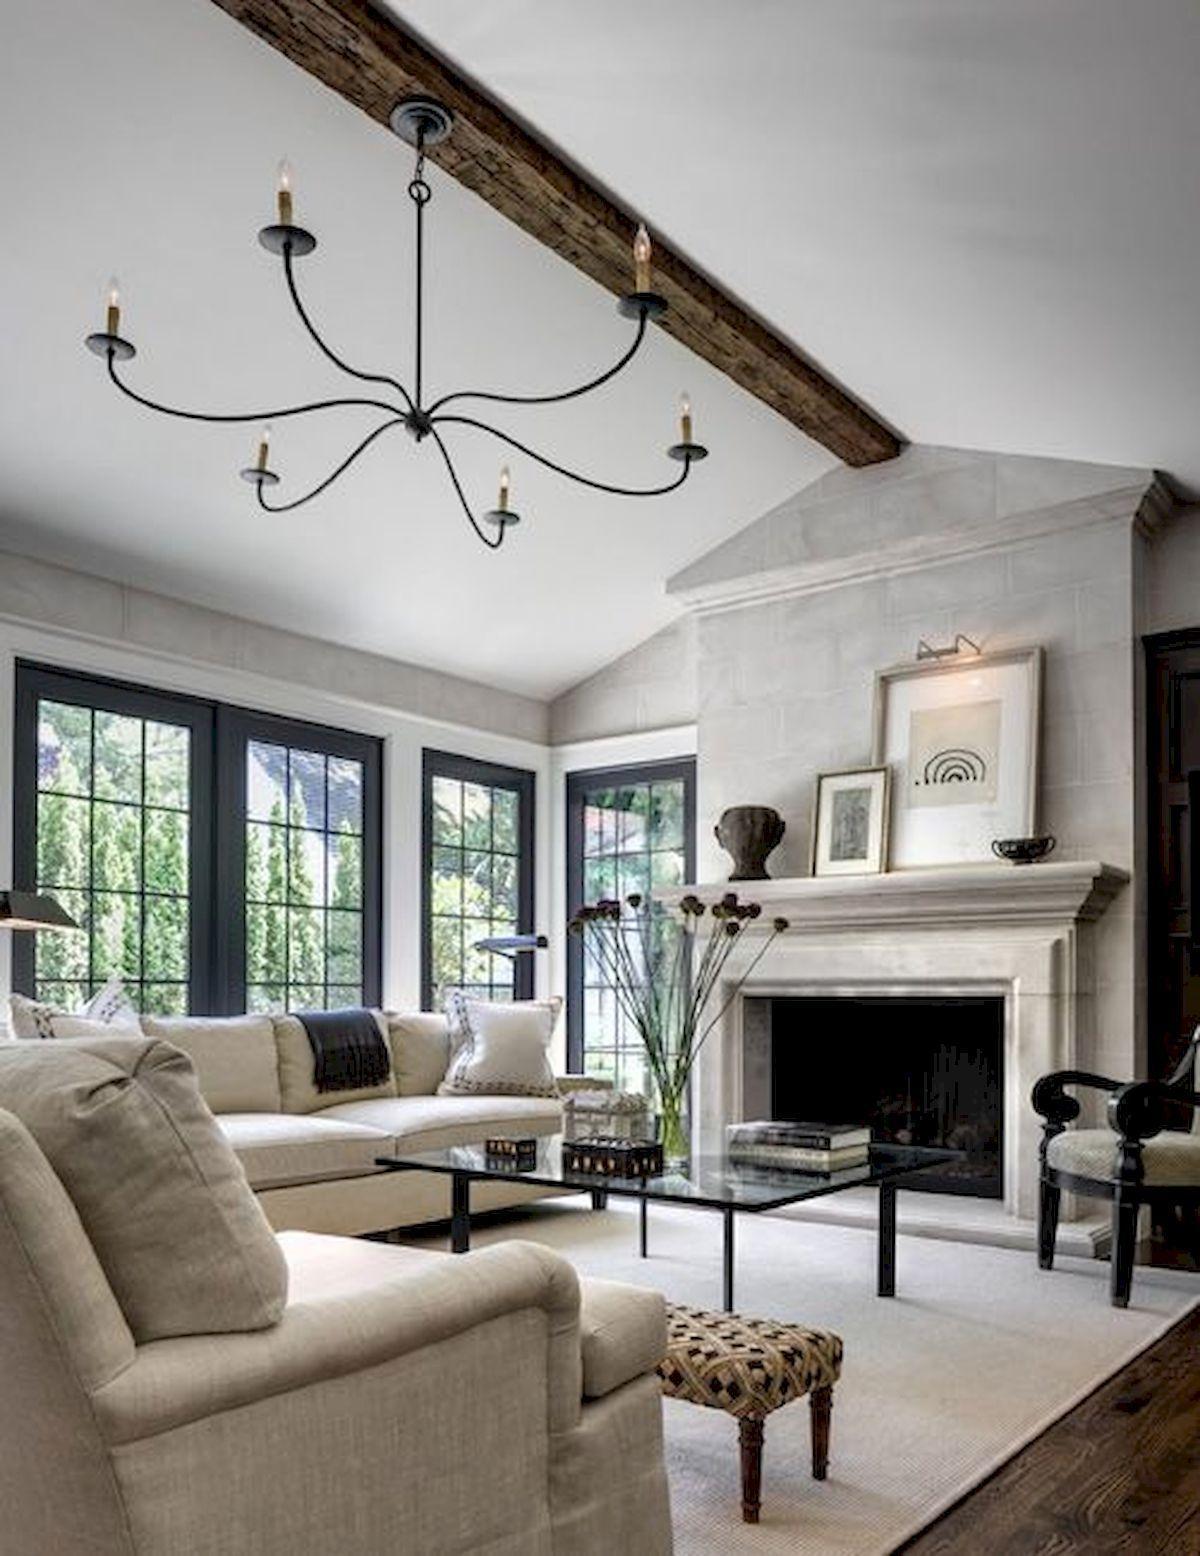 30 elegant farmhouse living room decor ideas (24) Farm